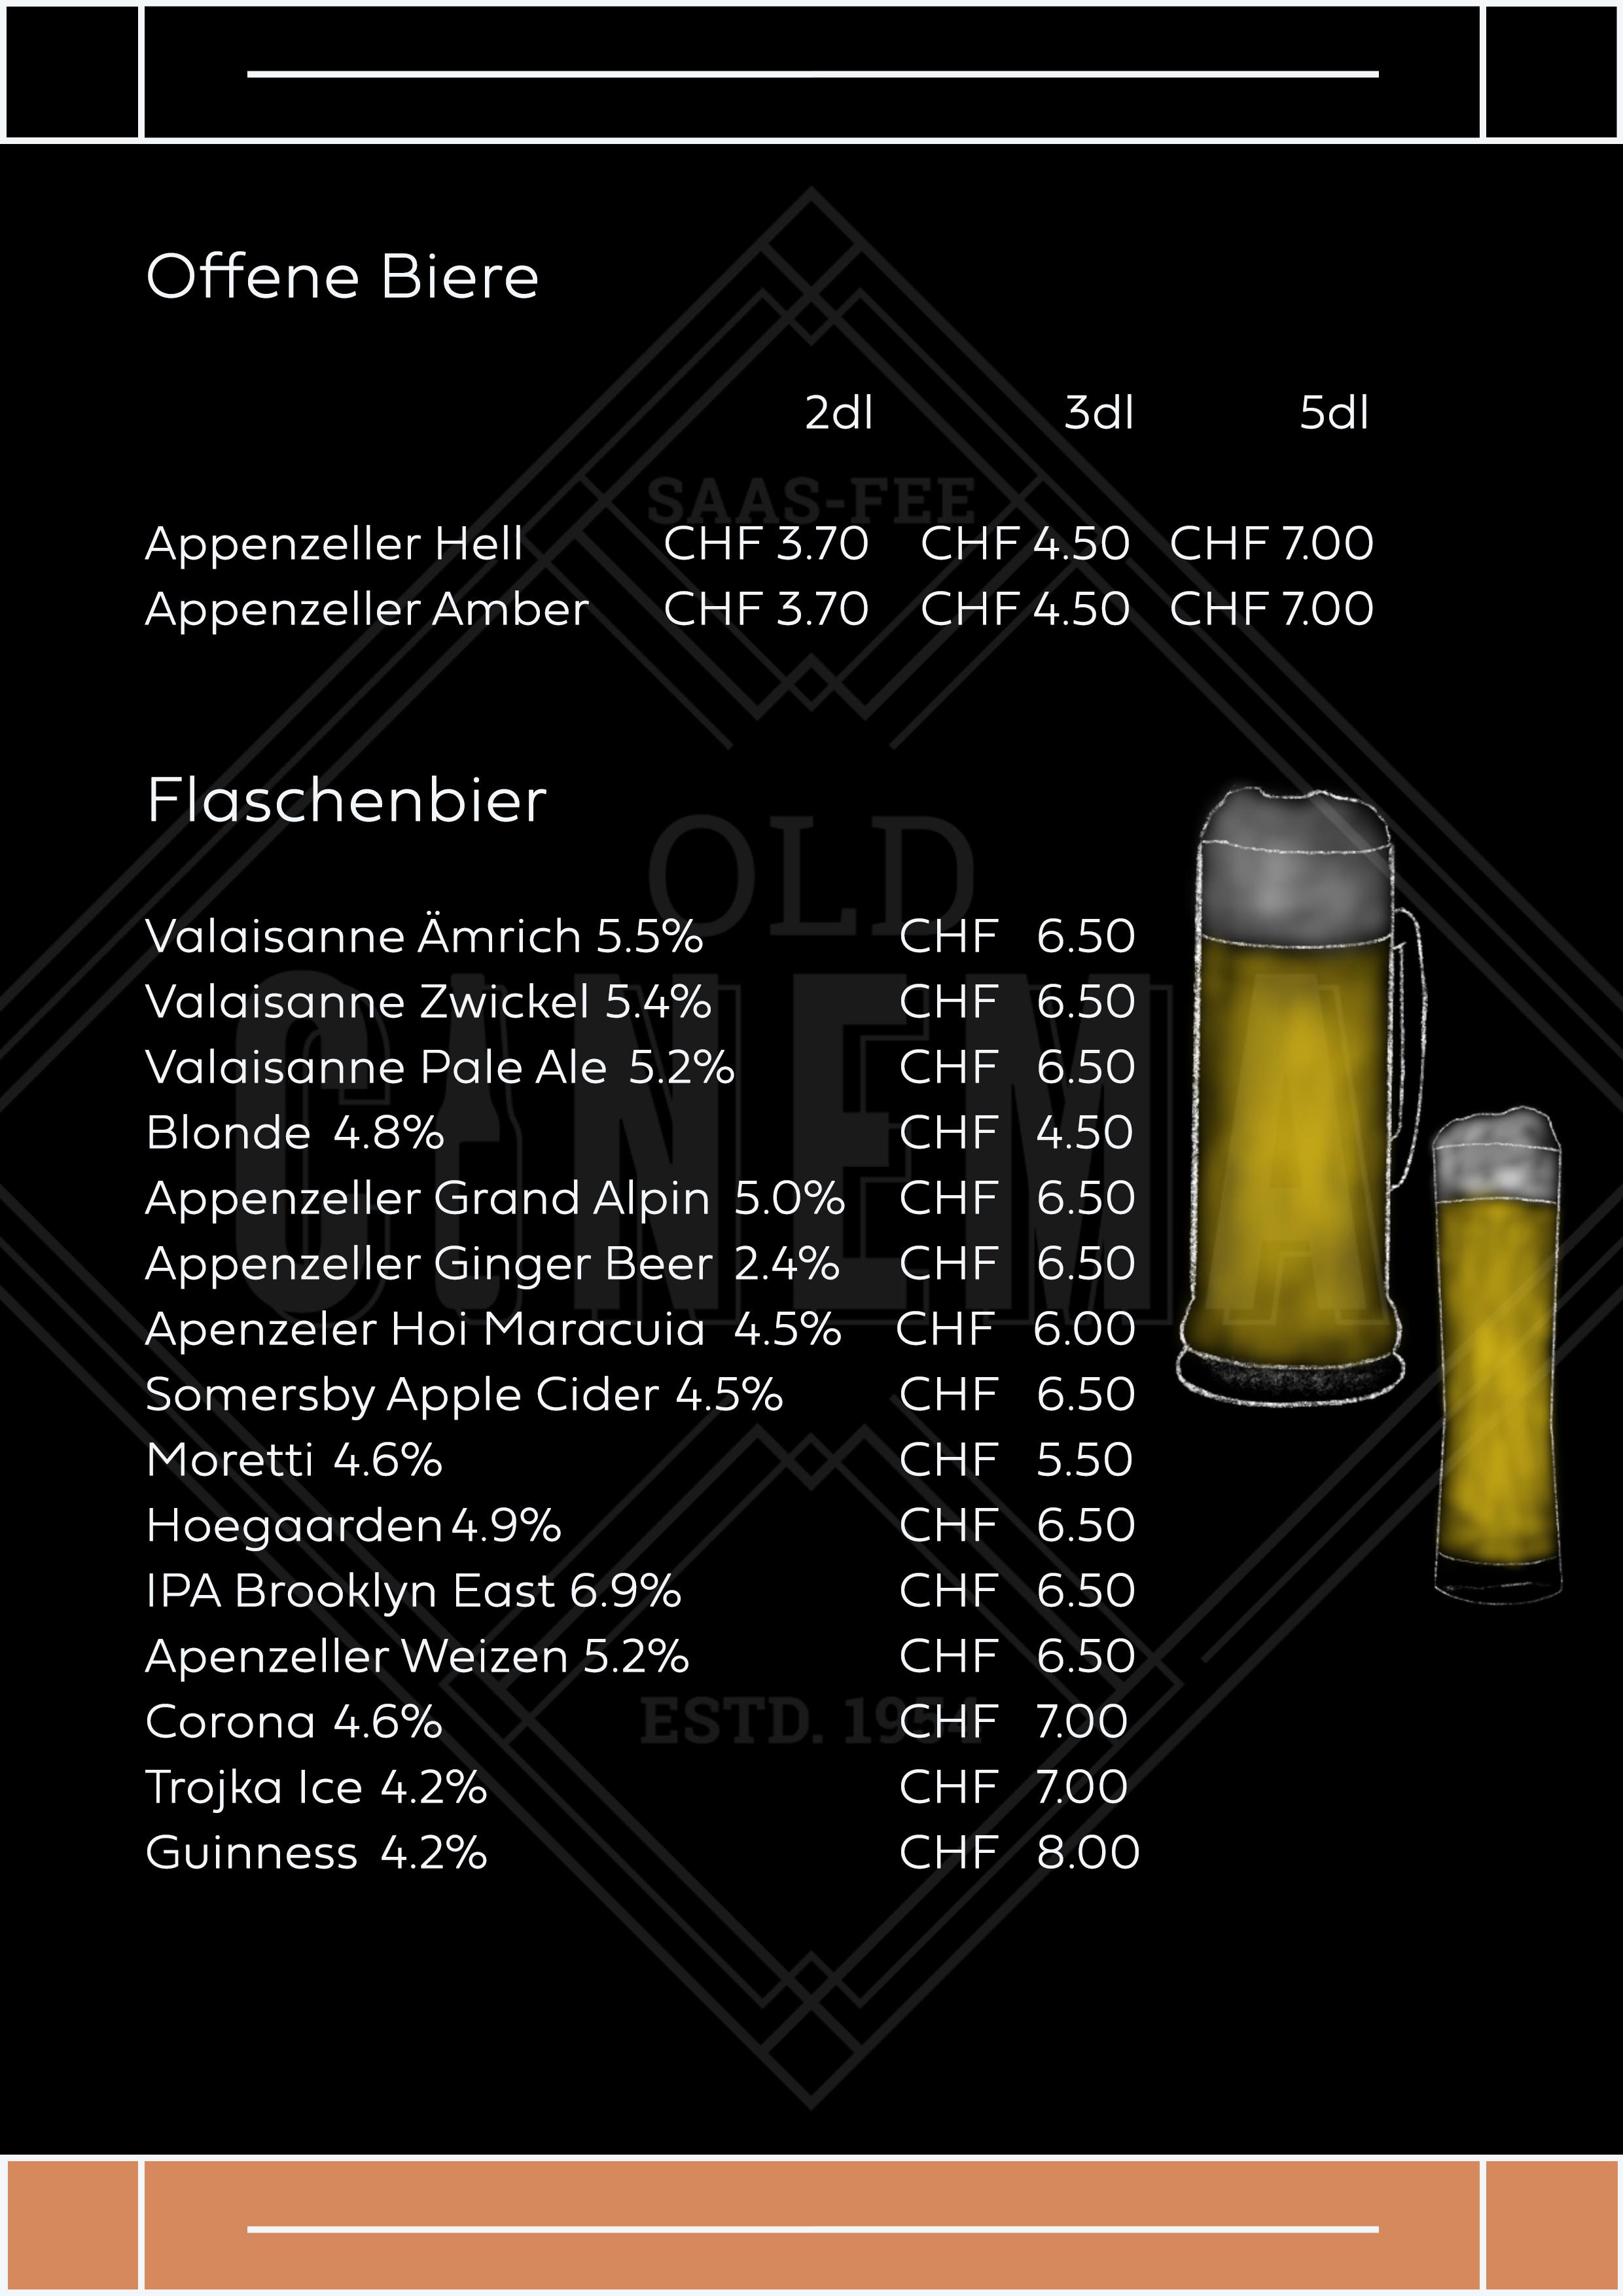 Bier_Page.jpg